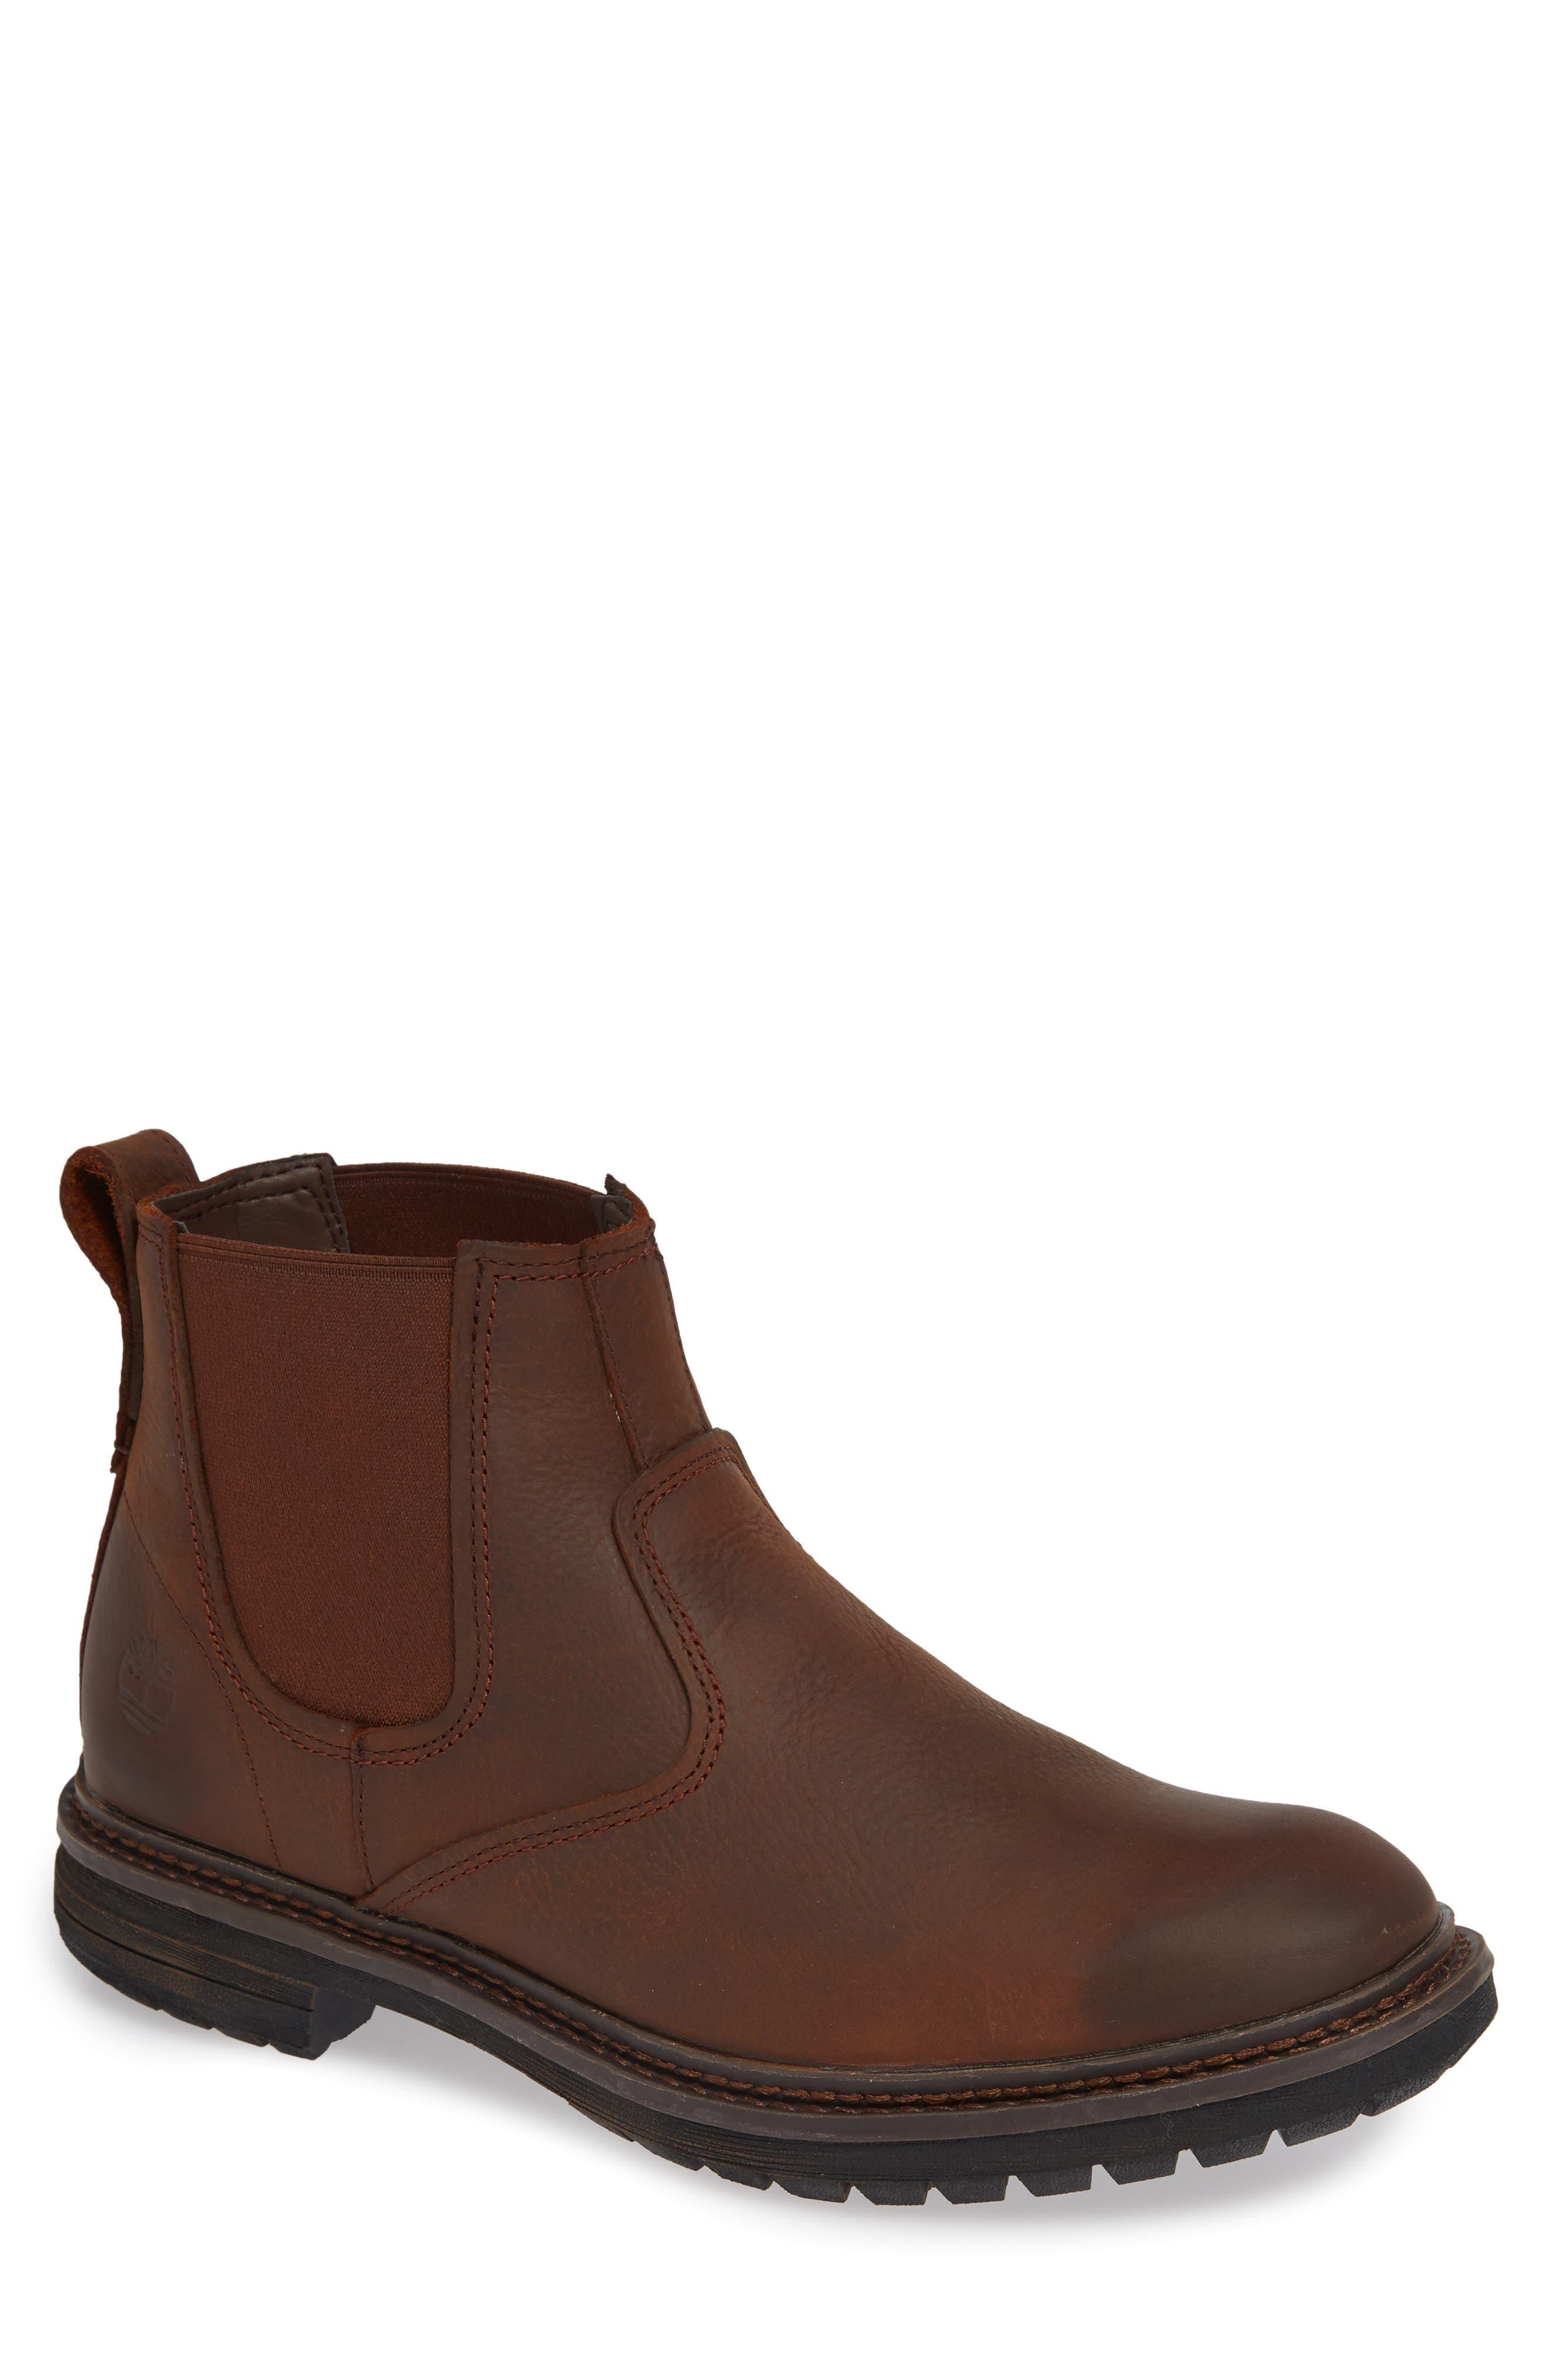 Timberland Logan Bay Water Resistant Chelsea Boot- Brown